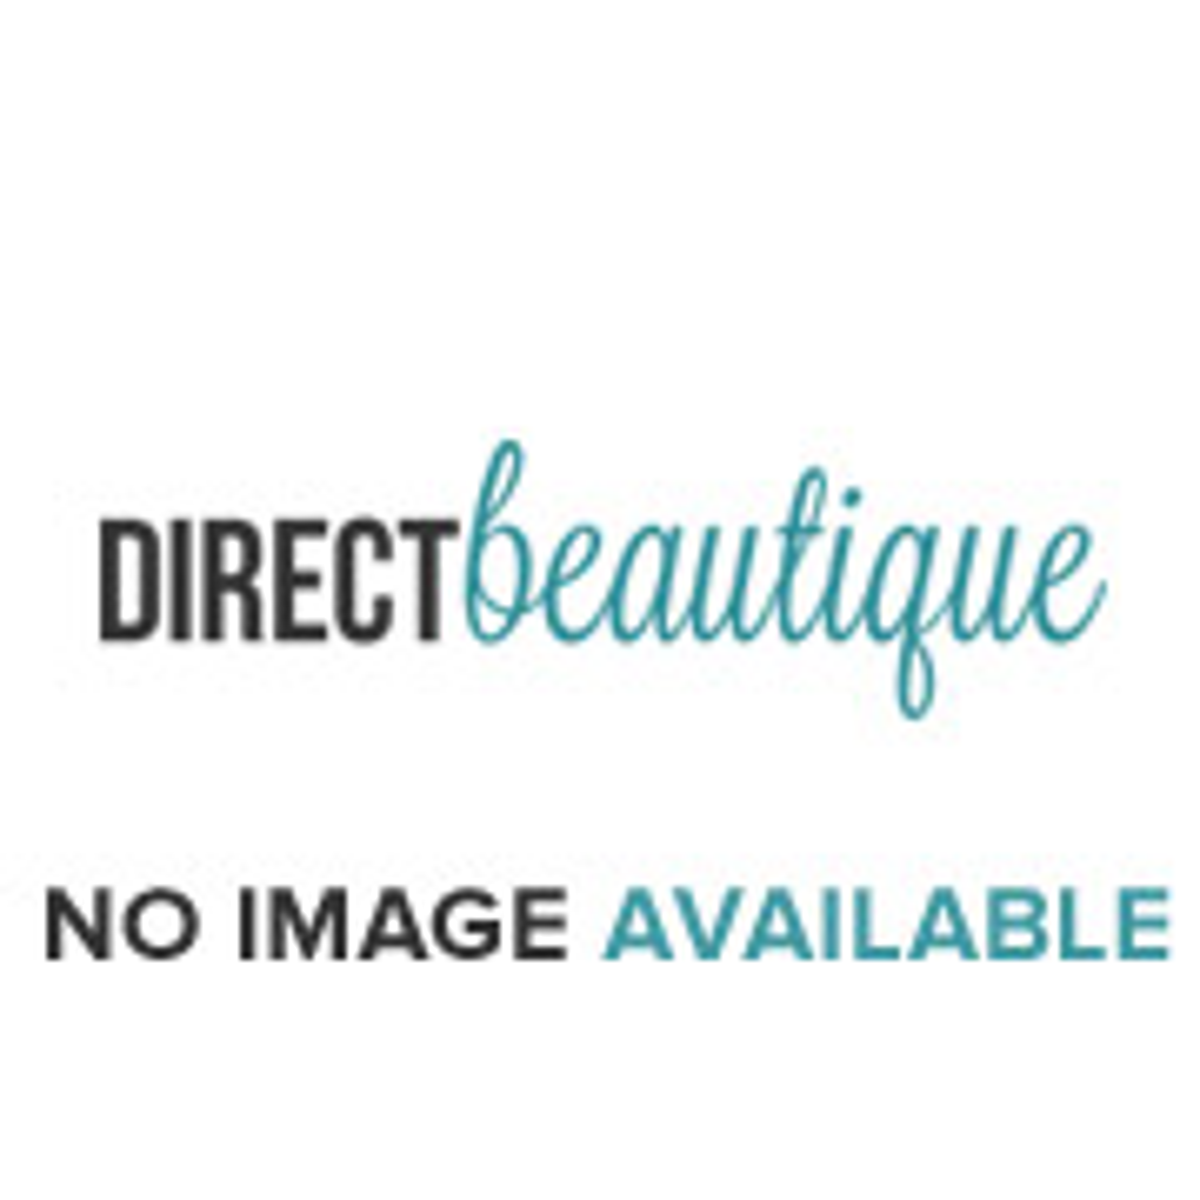 L'Oreal Loreal Glam Bronze Powder Duo 102 Brunette